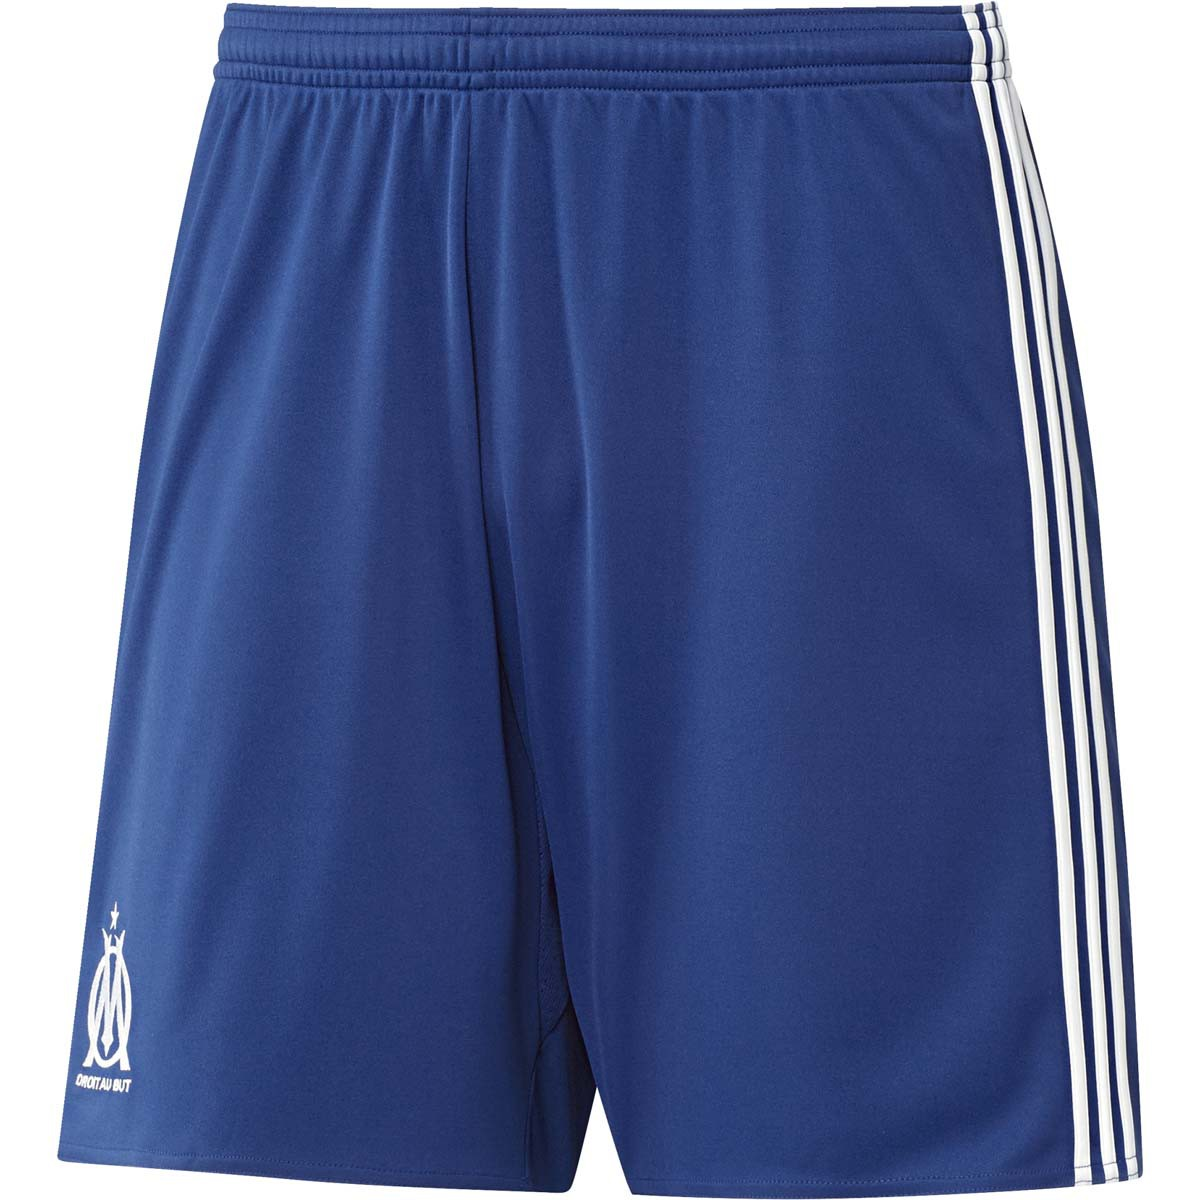 Rayon Adidas Junior 20172018 Exterieur Short Om derCoWQBx